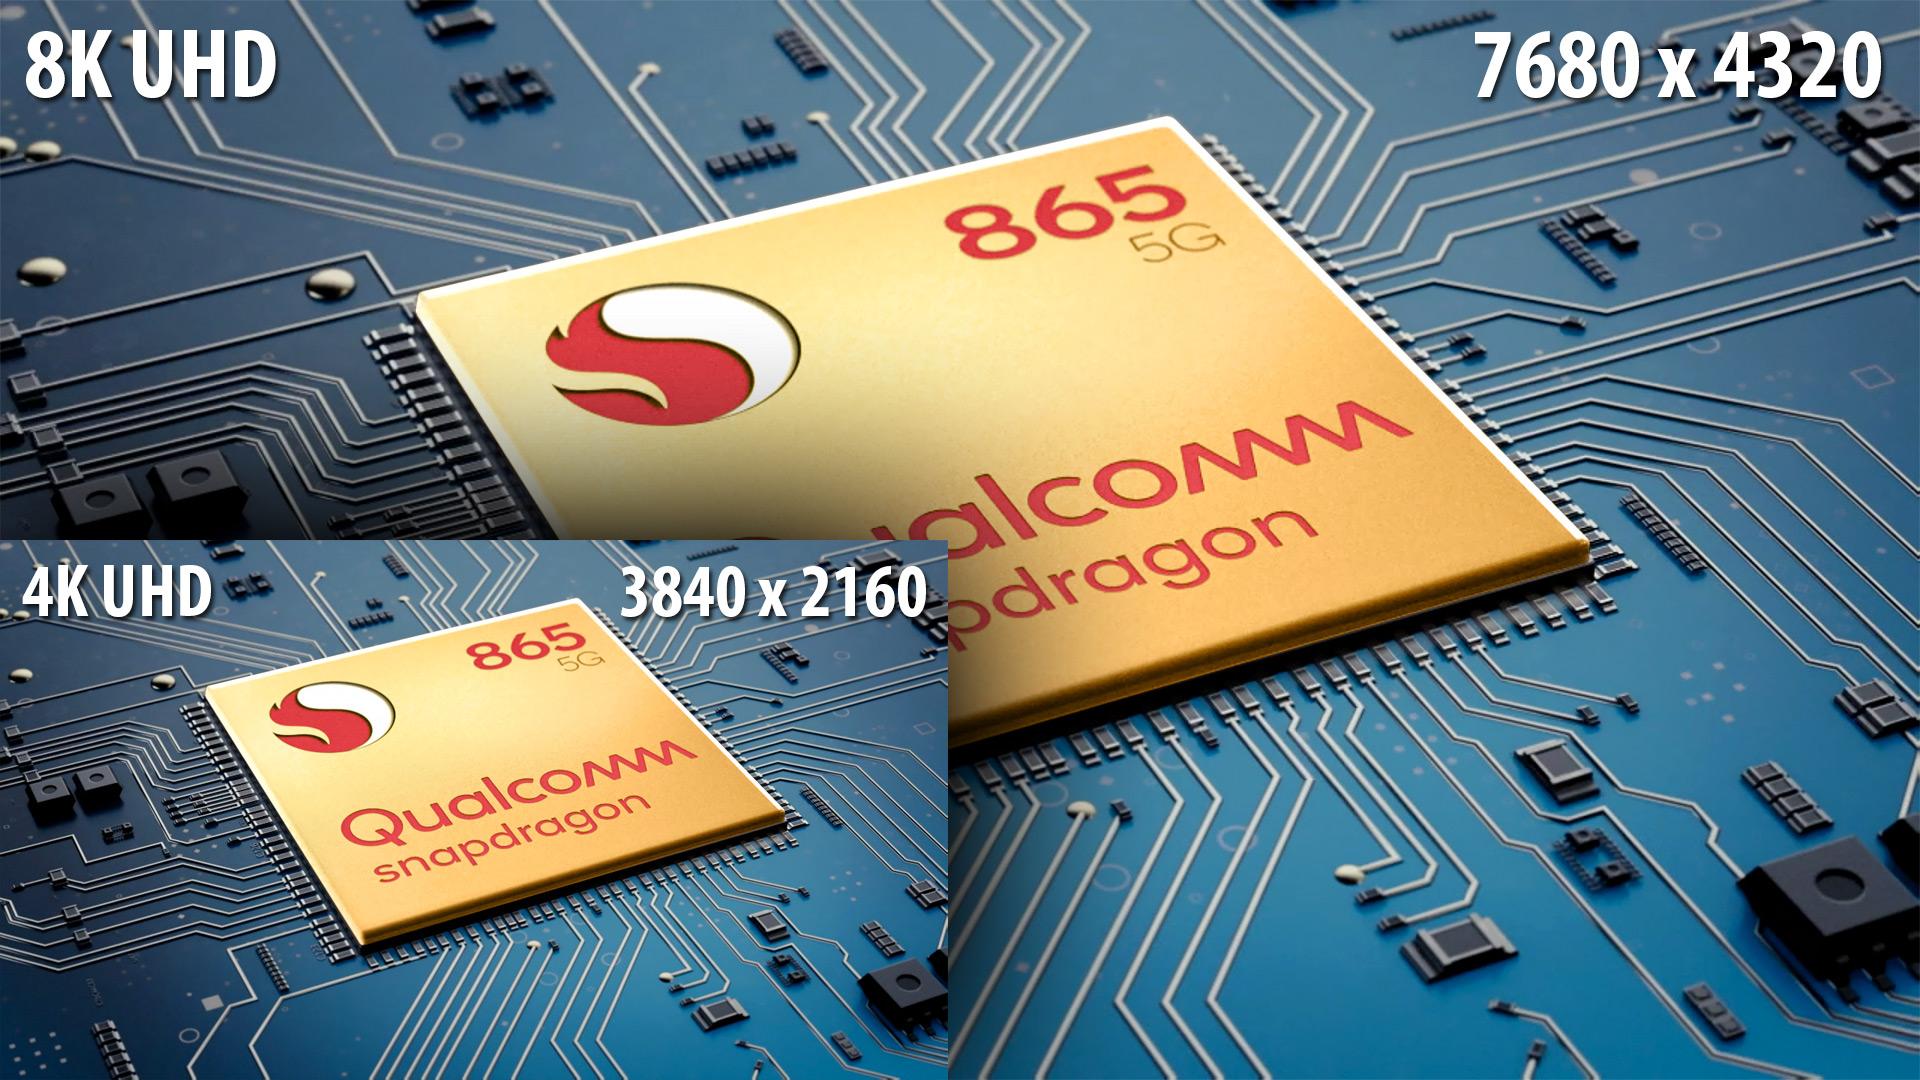 QualcomがSnapdragon 865を発表 - スマートフォンで8K/4K HDRビデオを記録